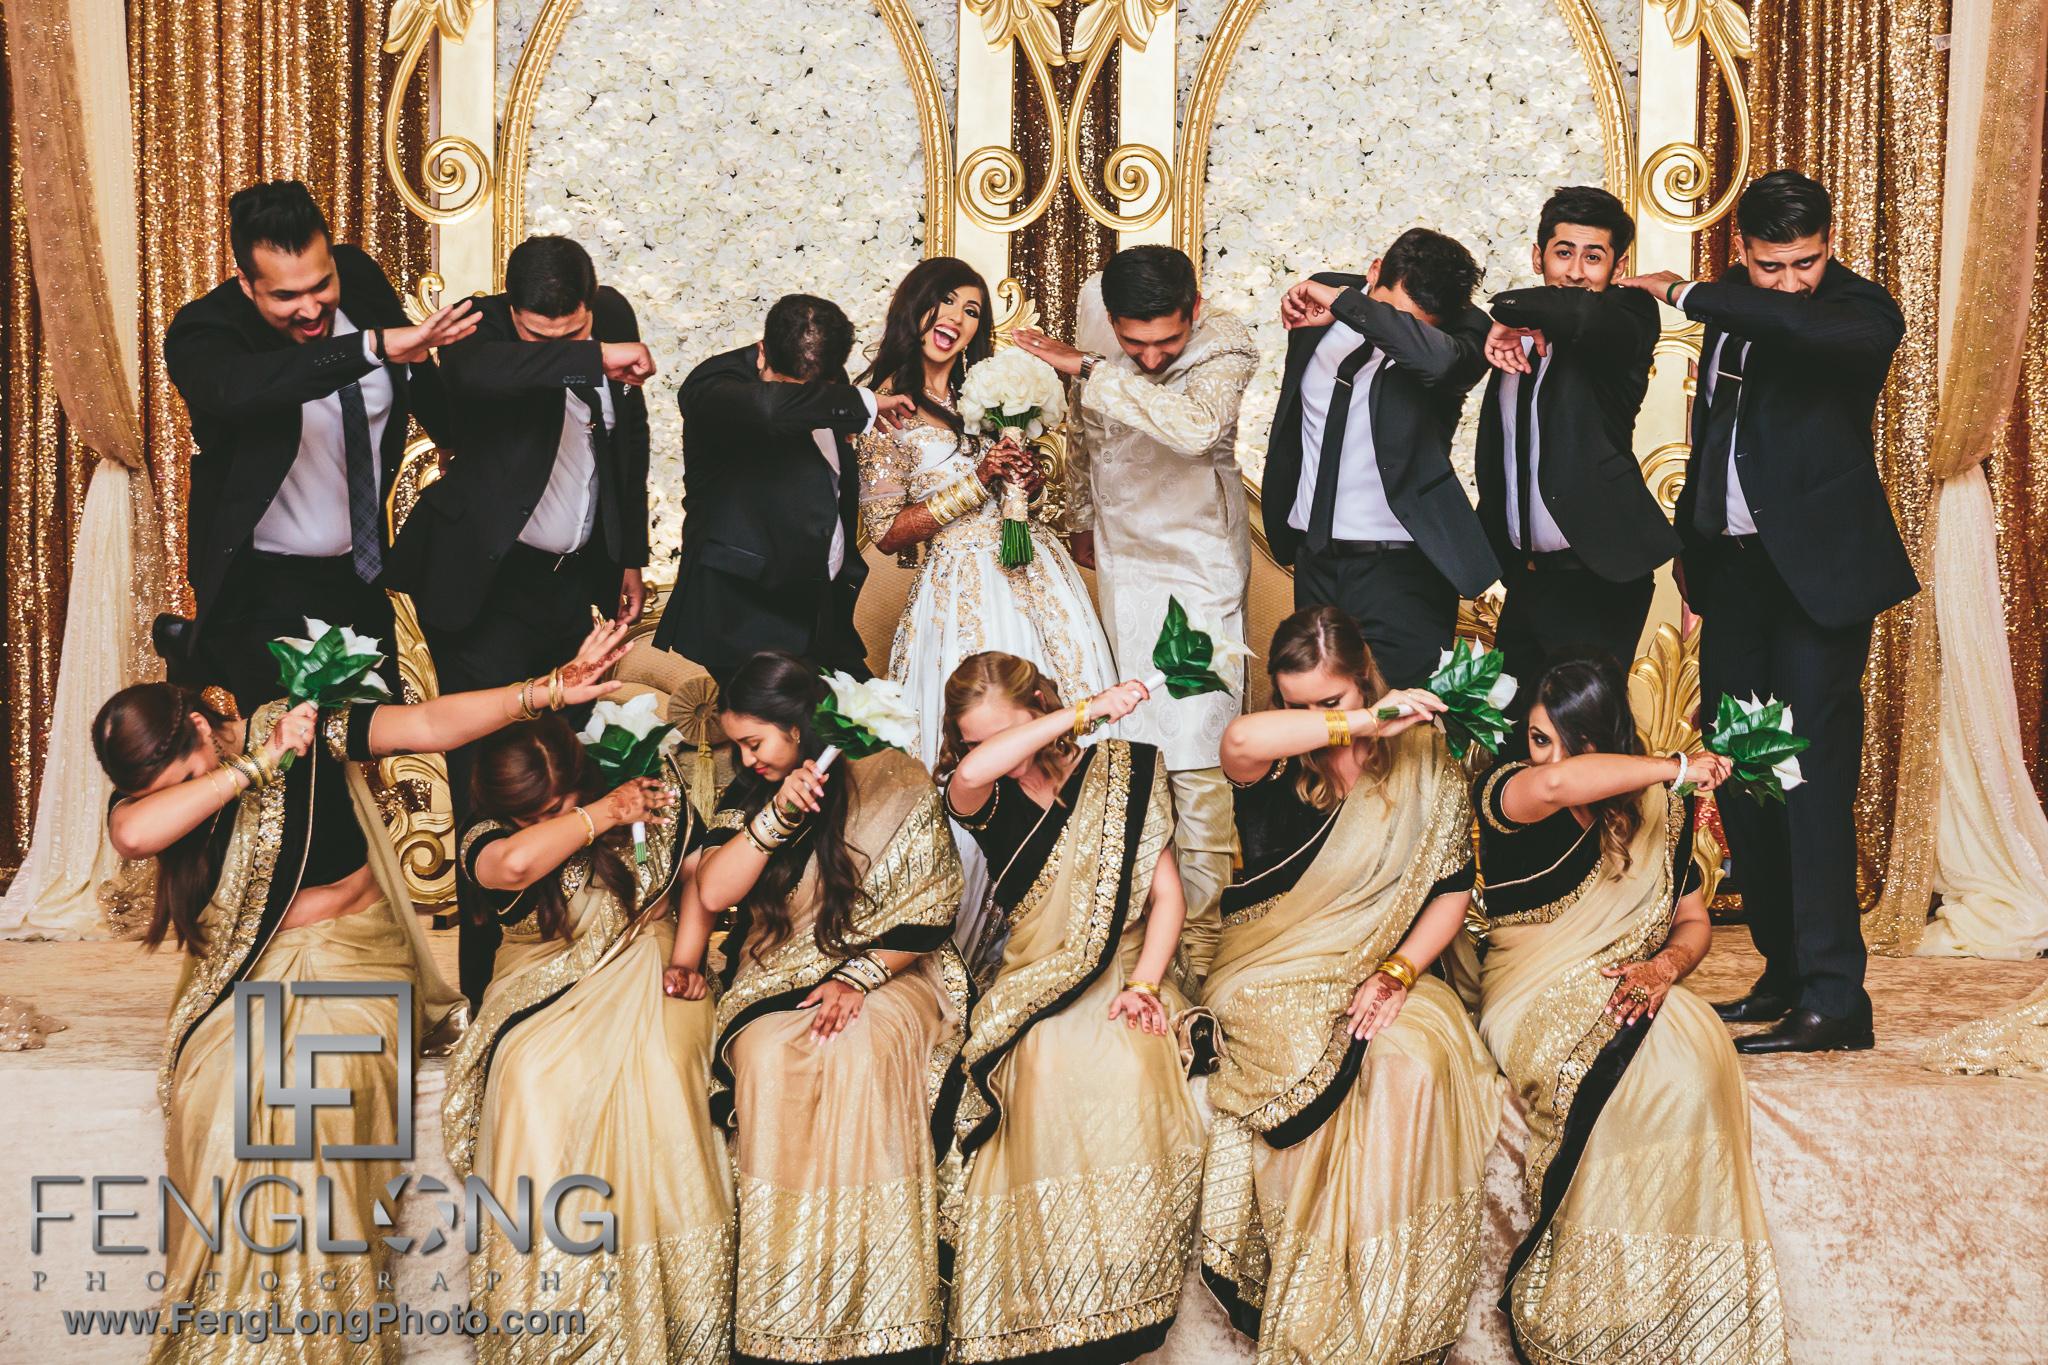 atlanta-indian-wedding-nikkah-reception-crowne-plaza-324003